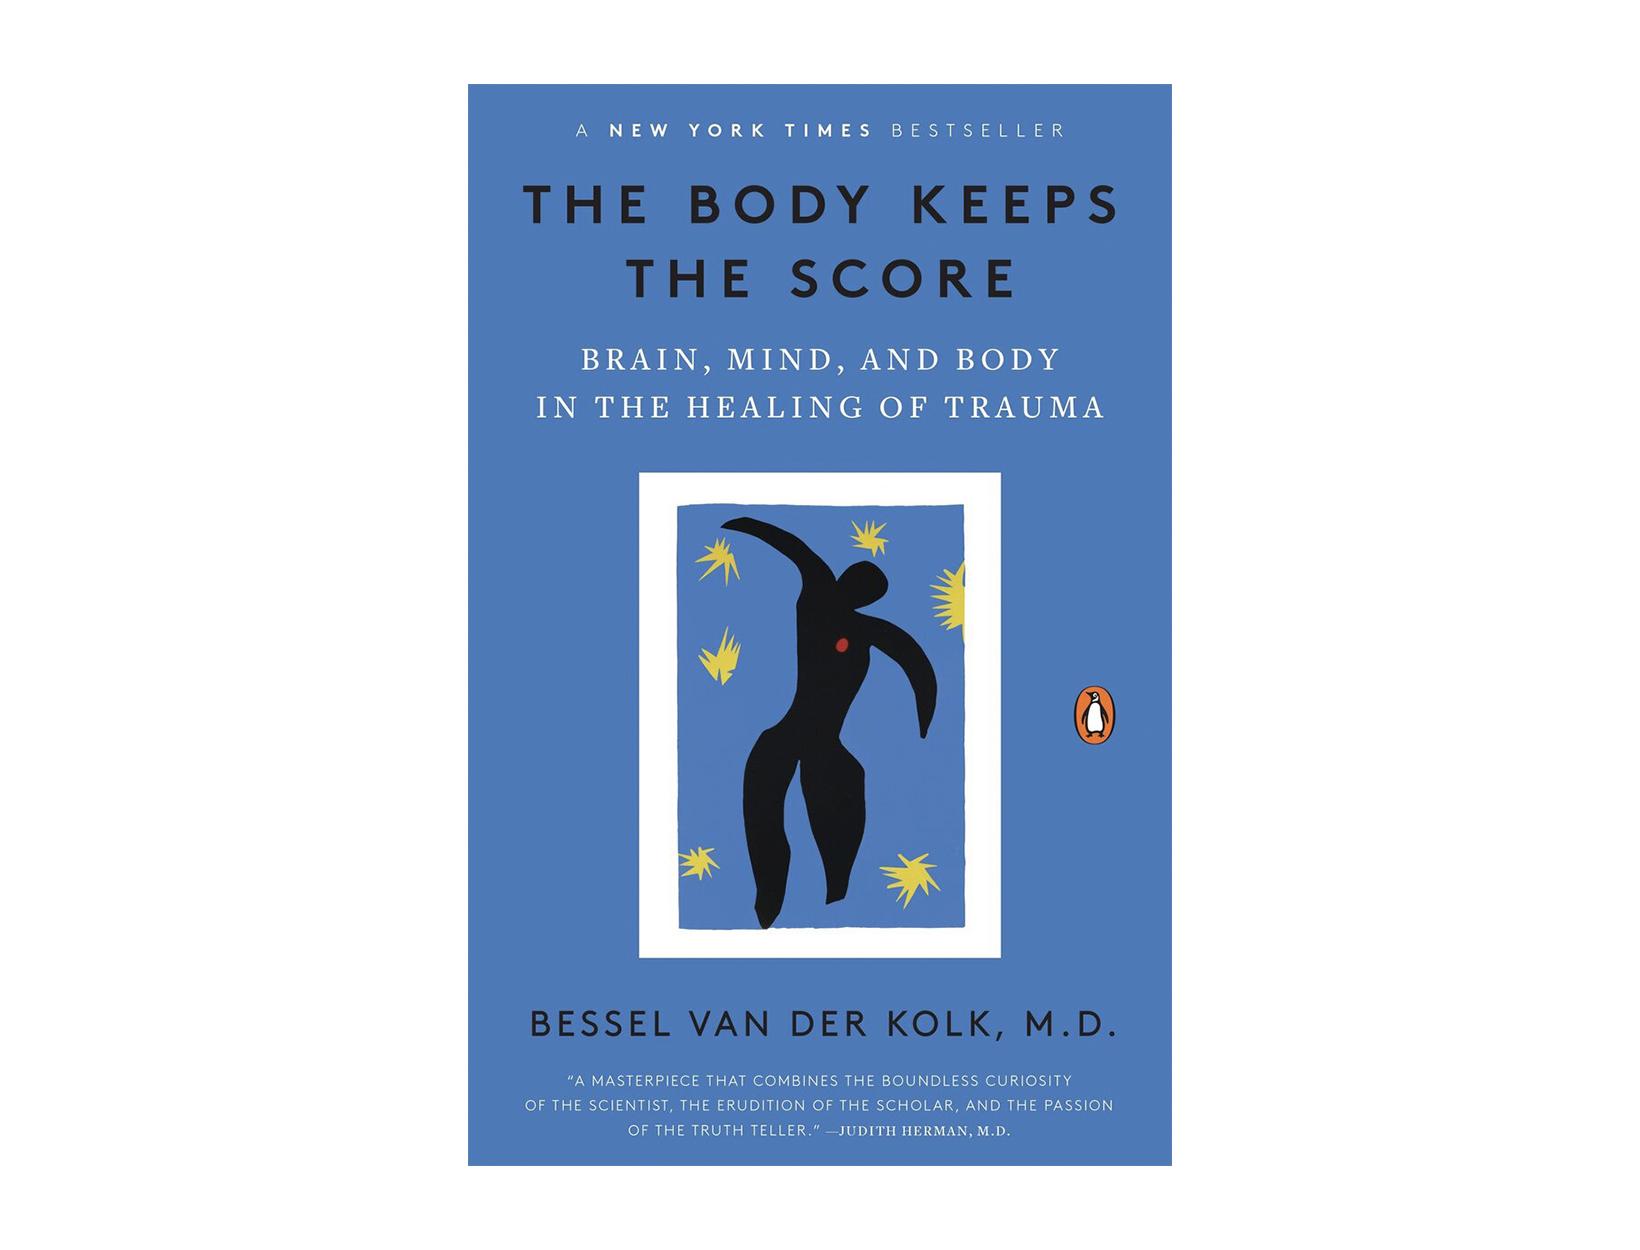 <em>The Body Keeps the Score</em> by Bessel van der Kolk, MD